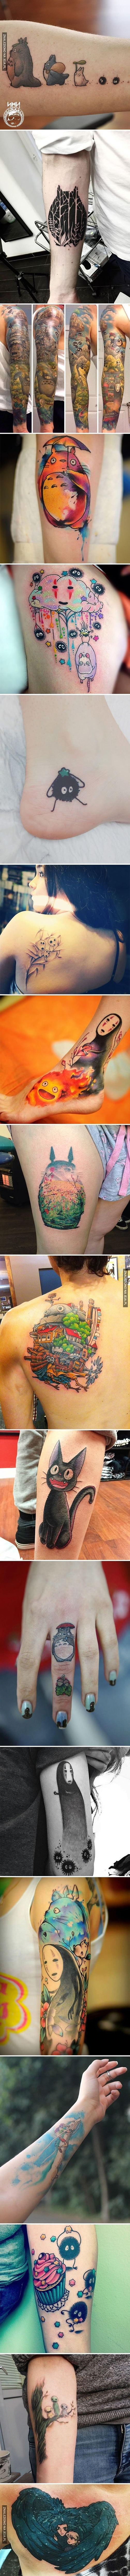 Tatuaże inspirowane filmami Miyazaki